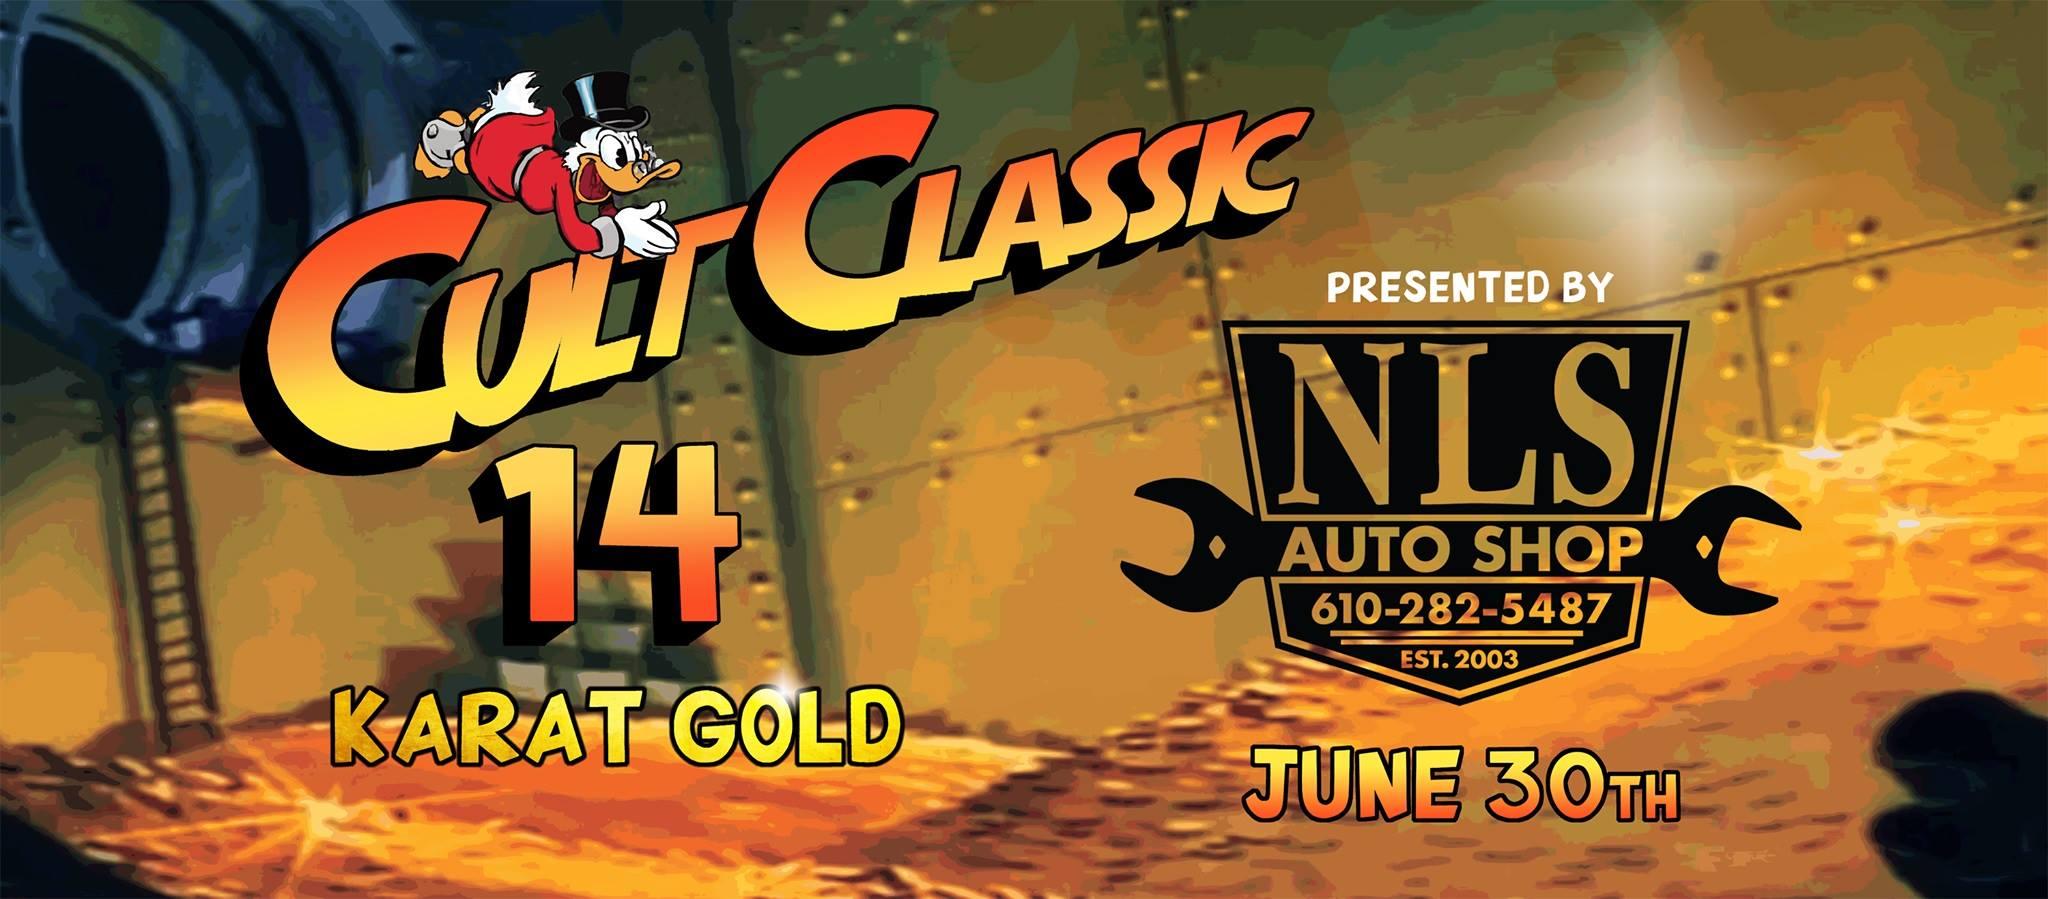 Audi Club Eastern Pennsylvania – Cult Classic car show Sunday, June 30TheCult Classic car showSunday, June 30